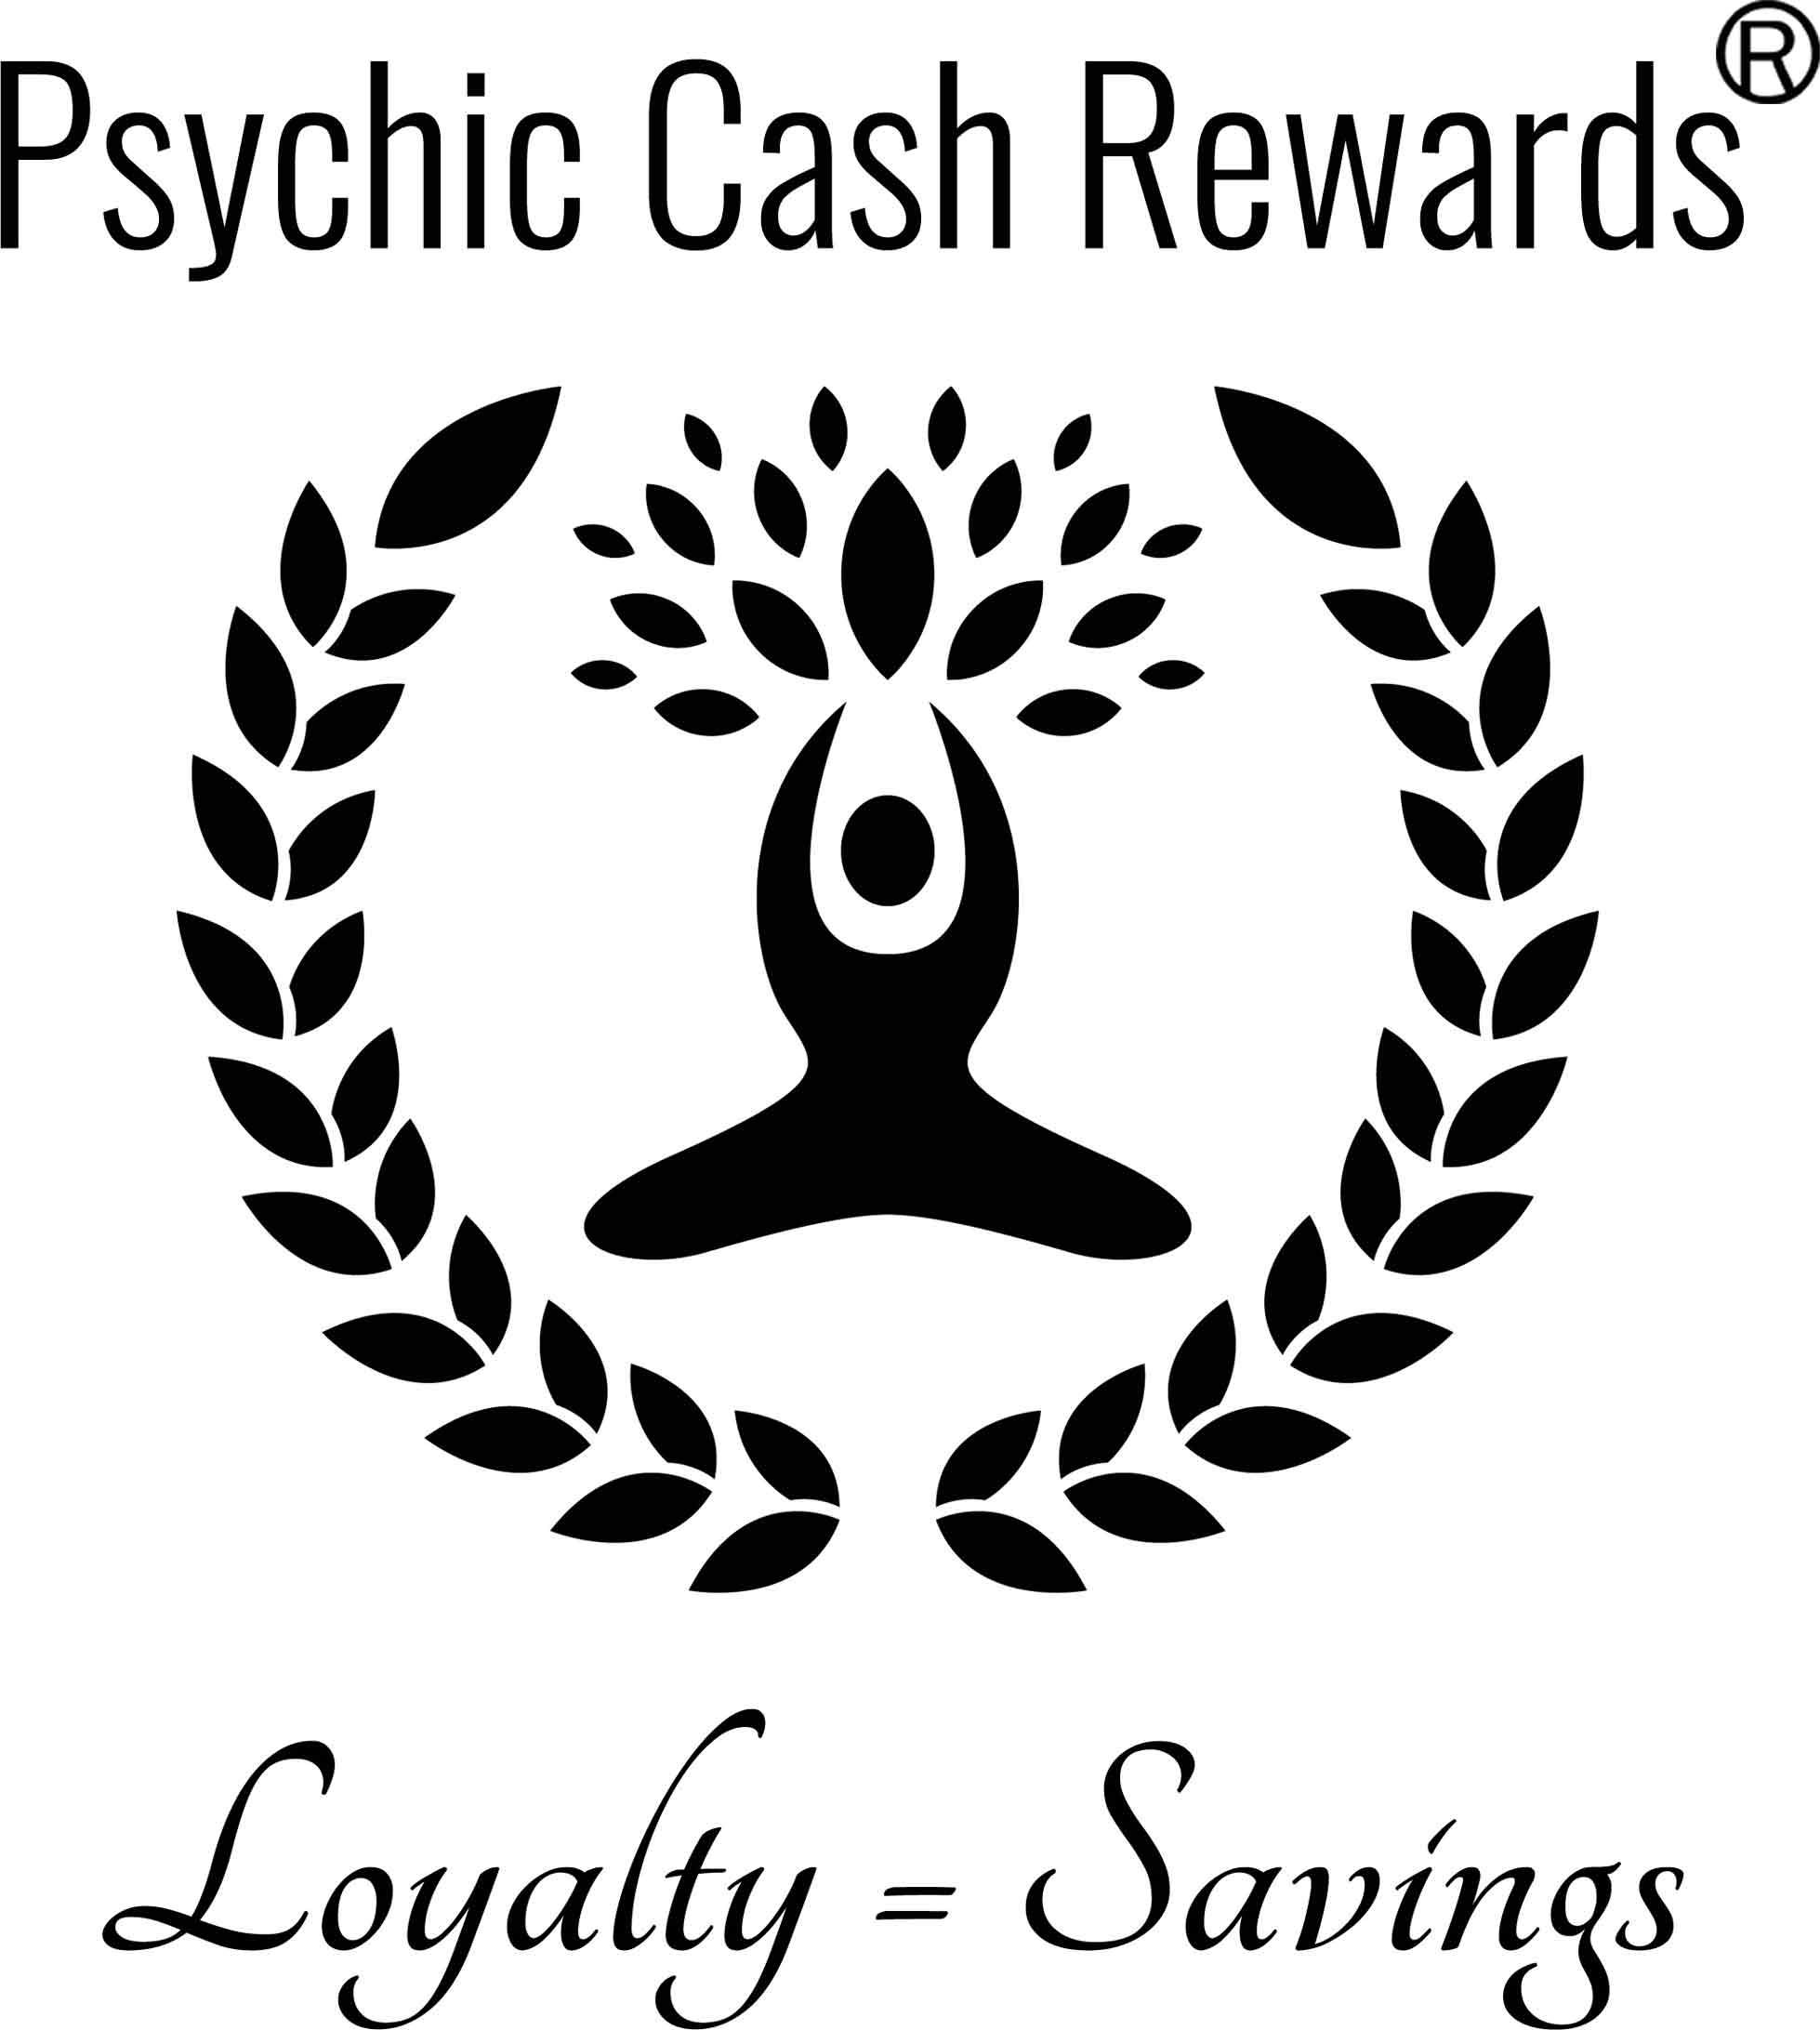 Psychic cash rewards